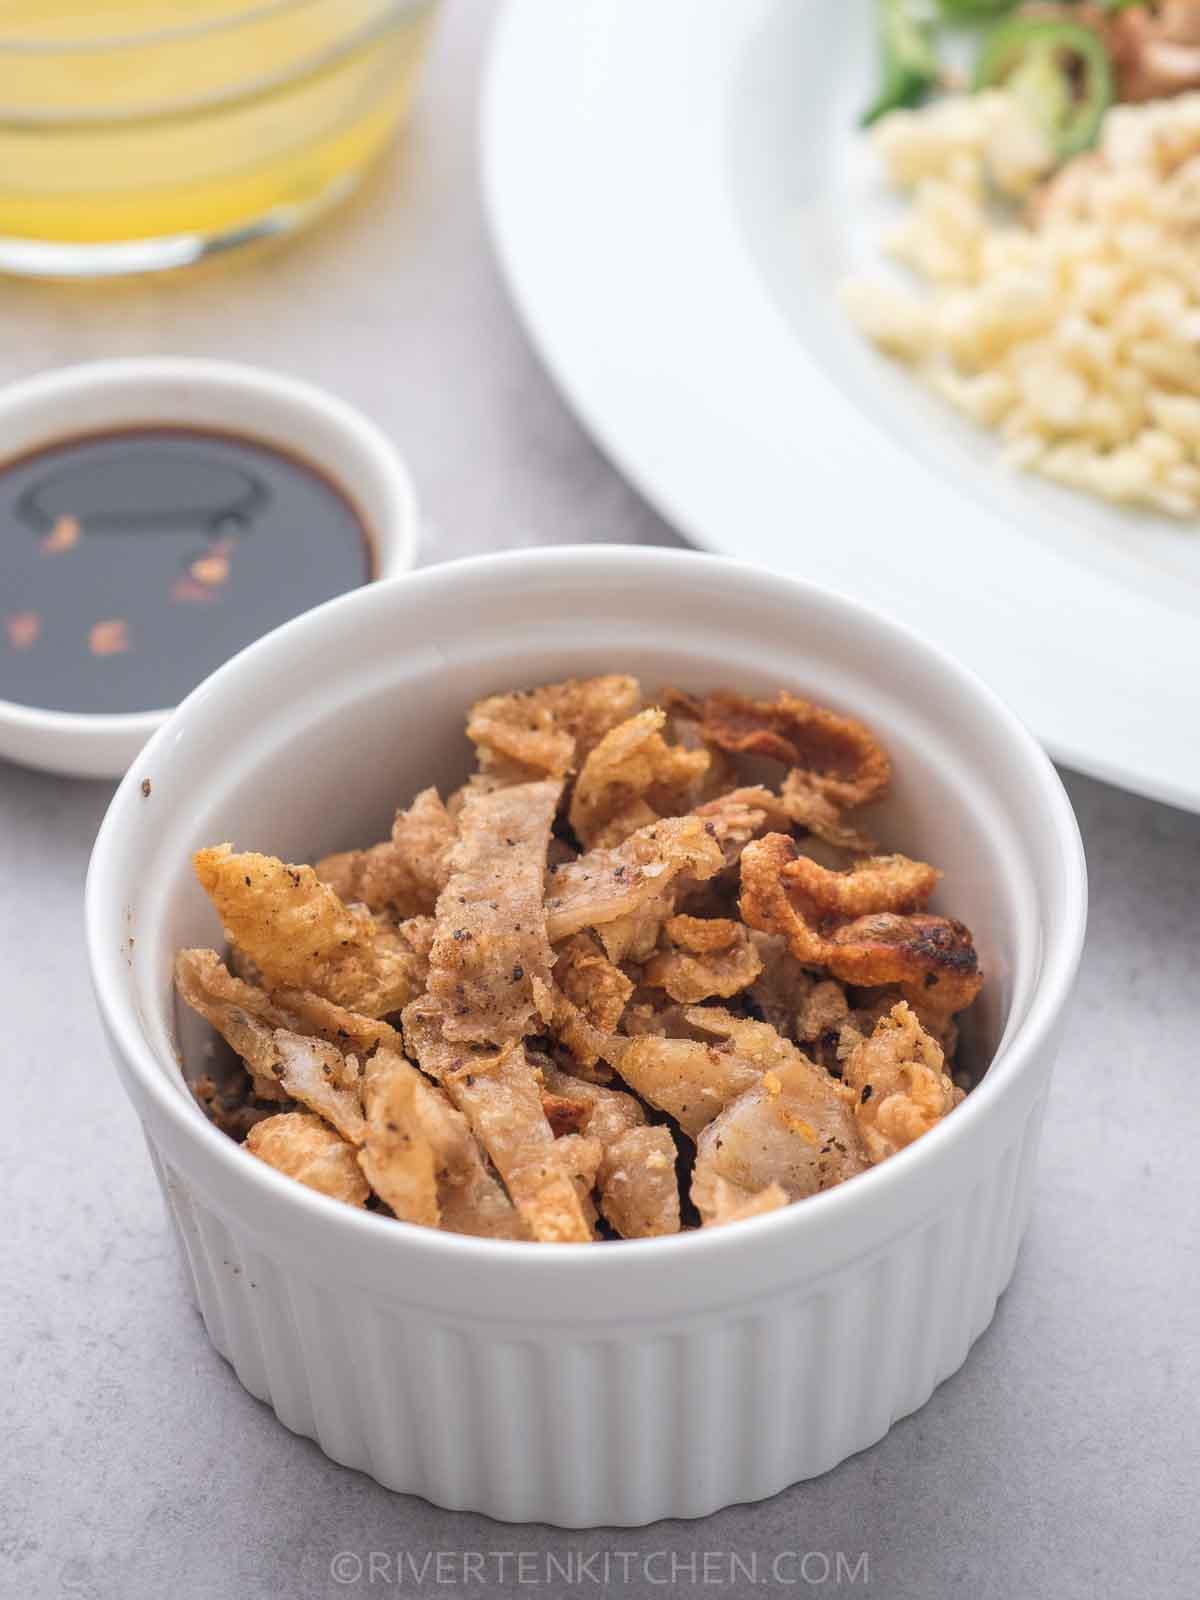 Fried Crispy Chicken Skin